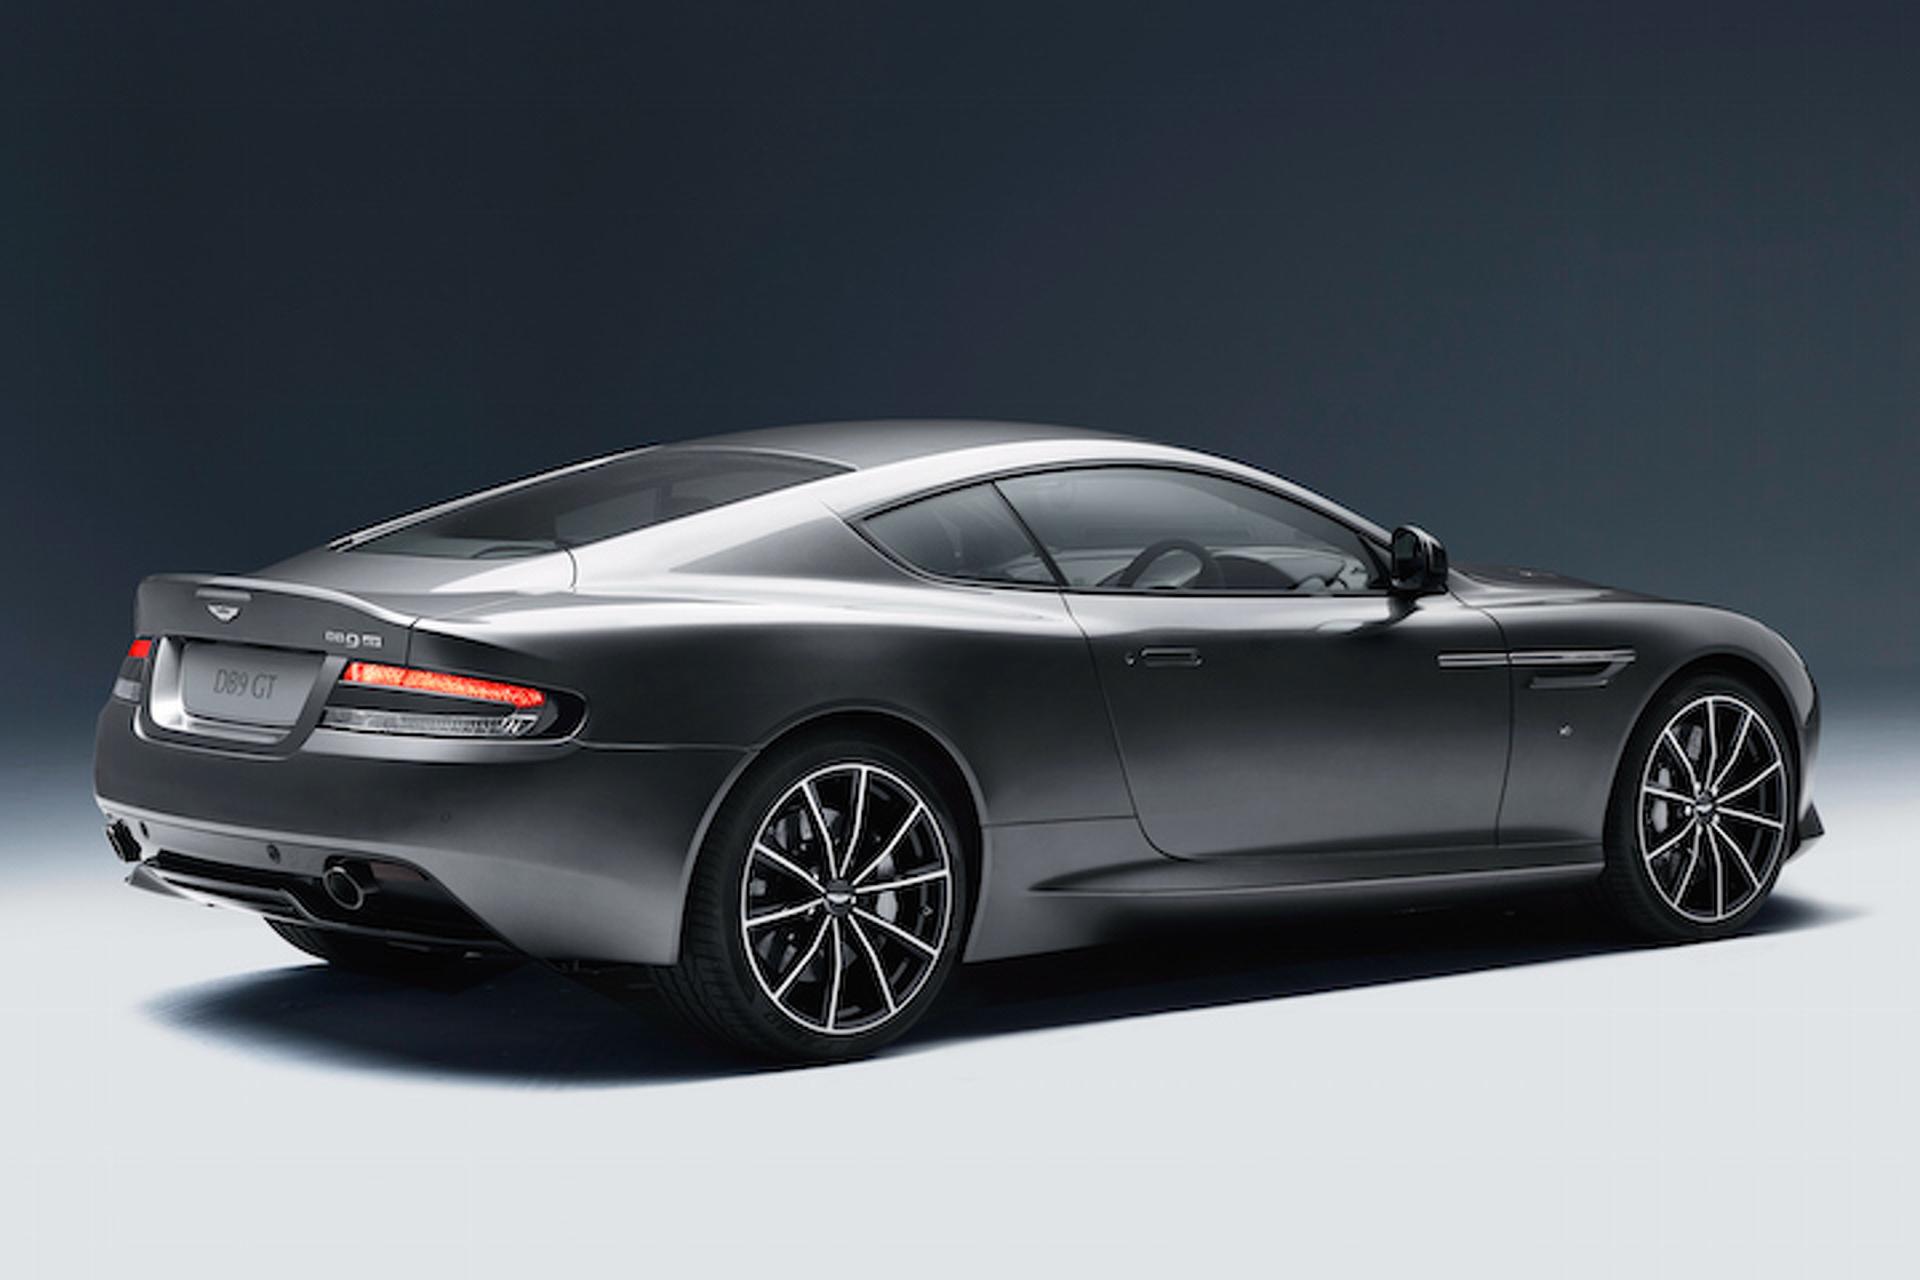 Aston Martin Just Built Its Fastest DB9 Ever